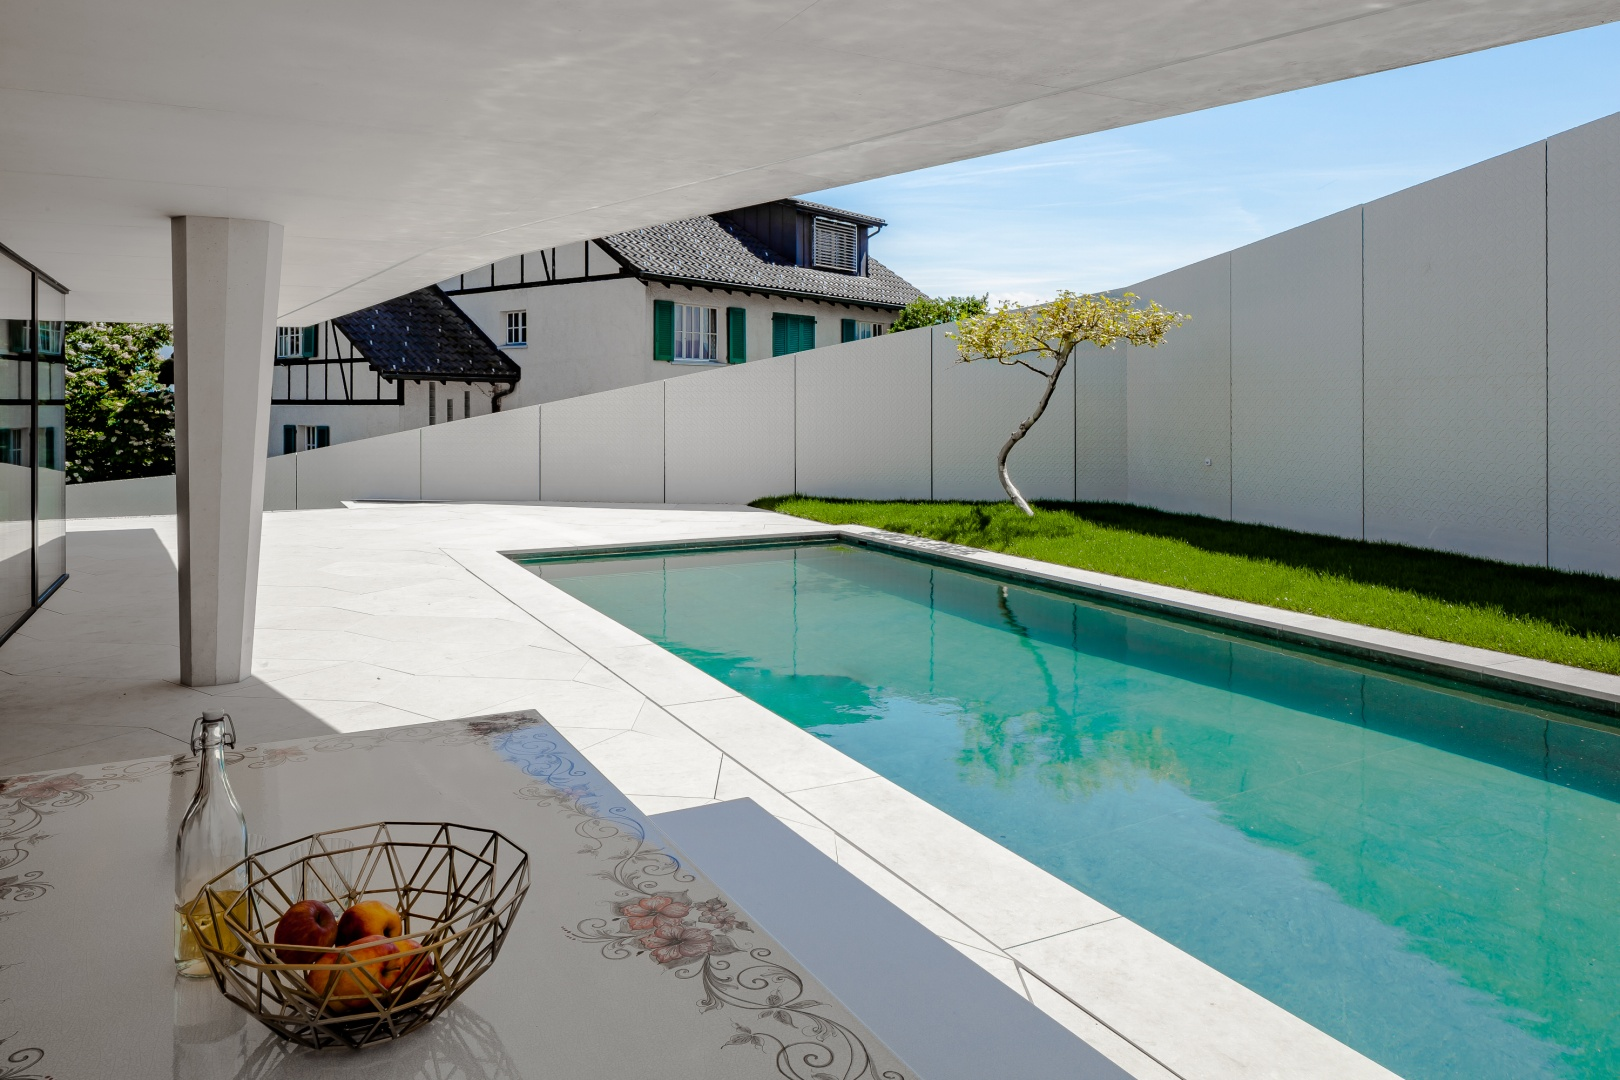 Terrasse mit Pool © Mark Drotsky, Langenthal